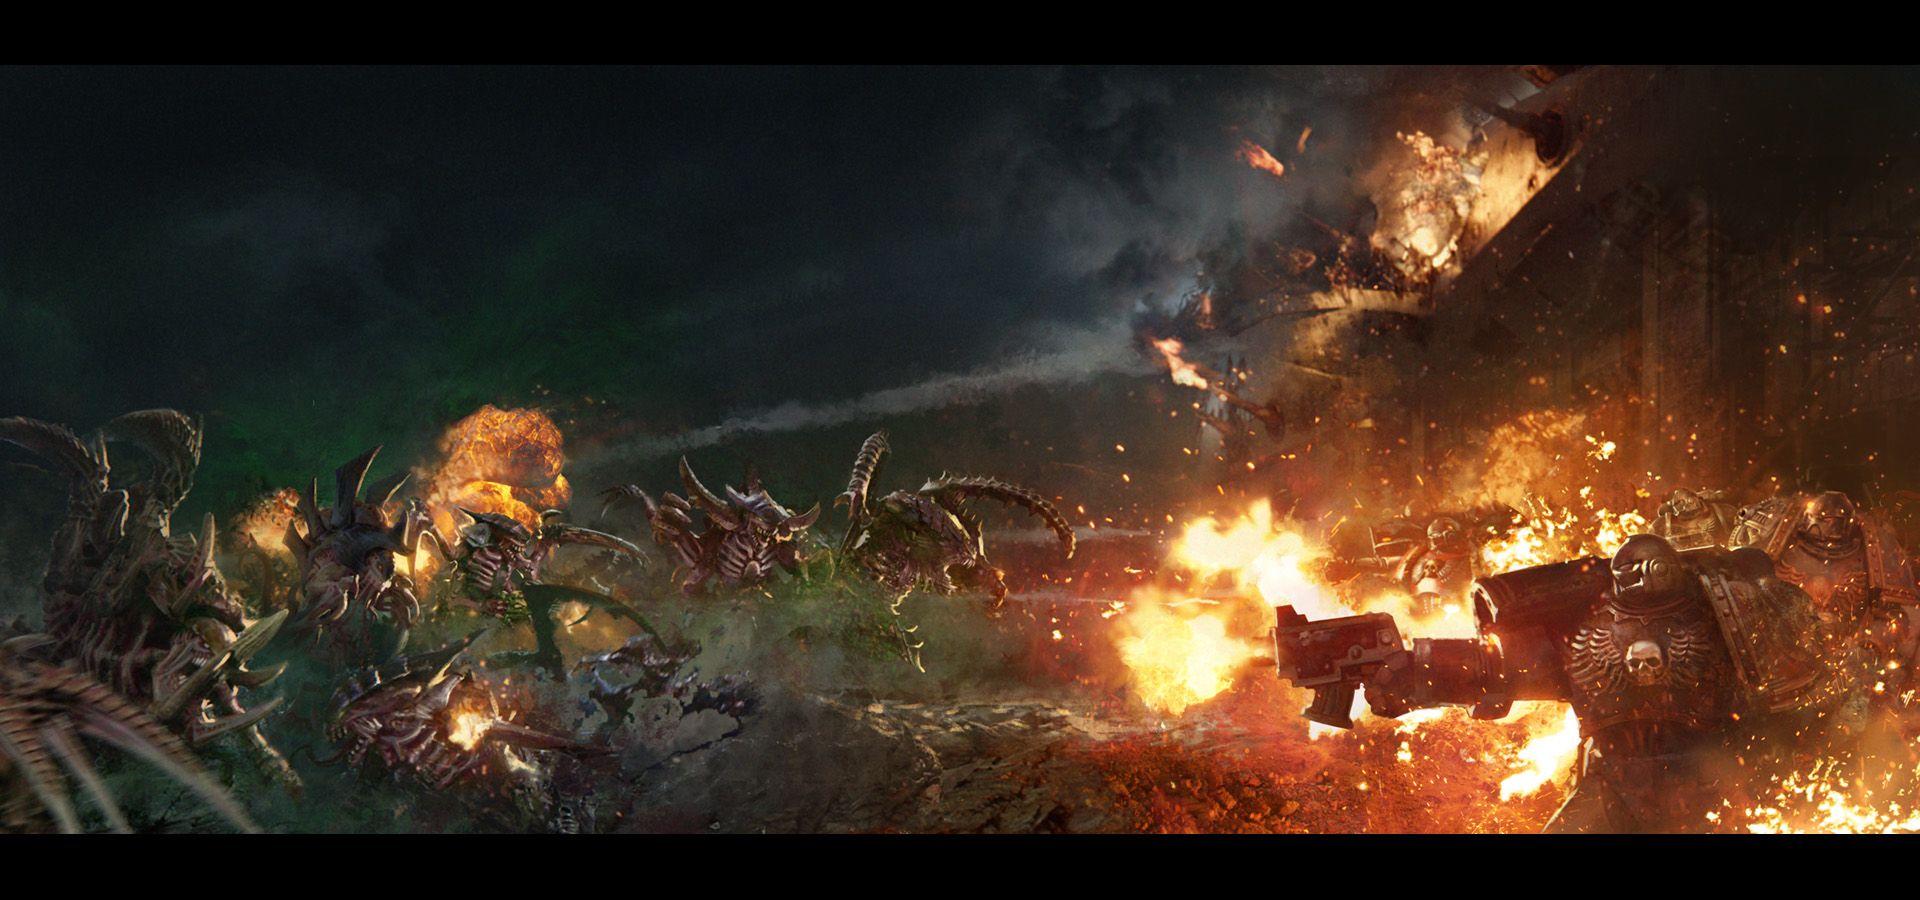 Shield of Baal: Tyranids vs Flesh Tearers by agnidevi.deviantart.com on @DeviantArt